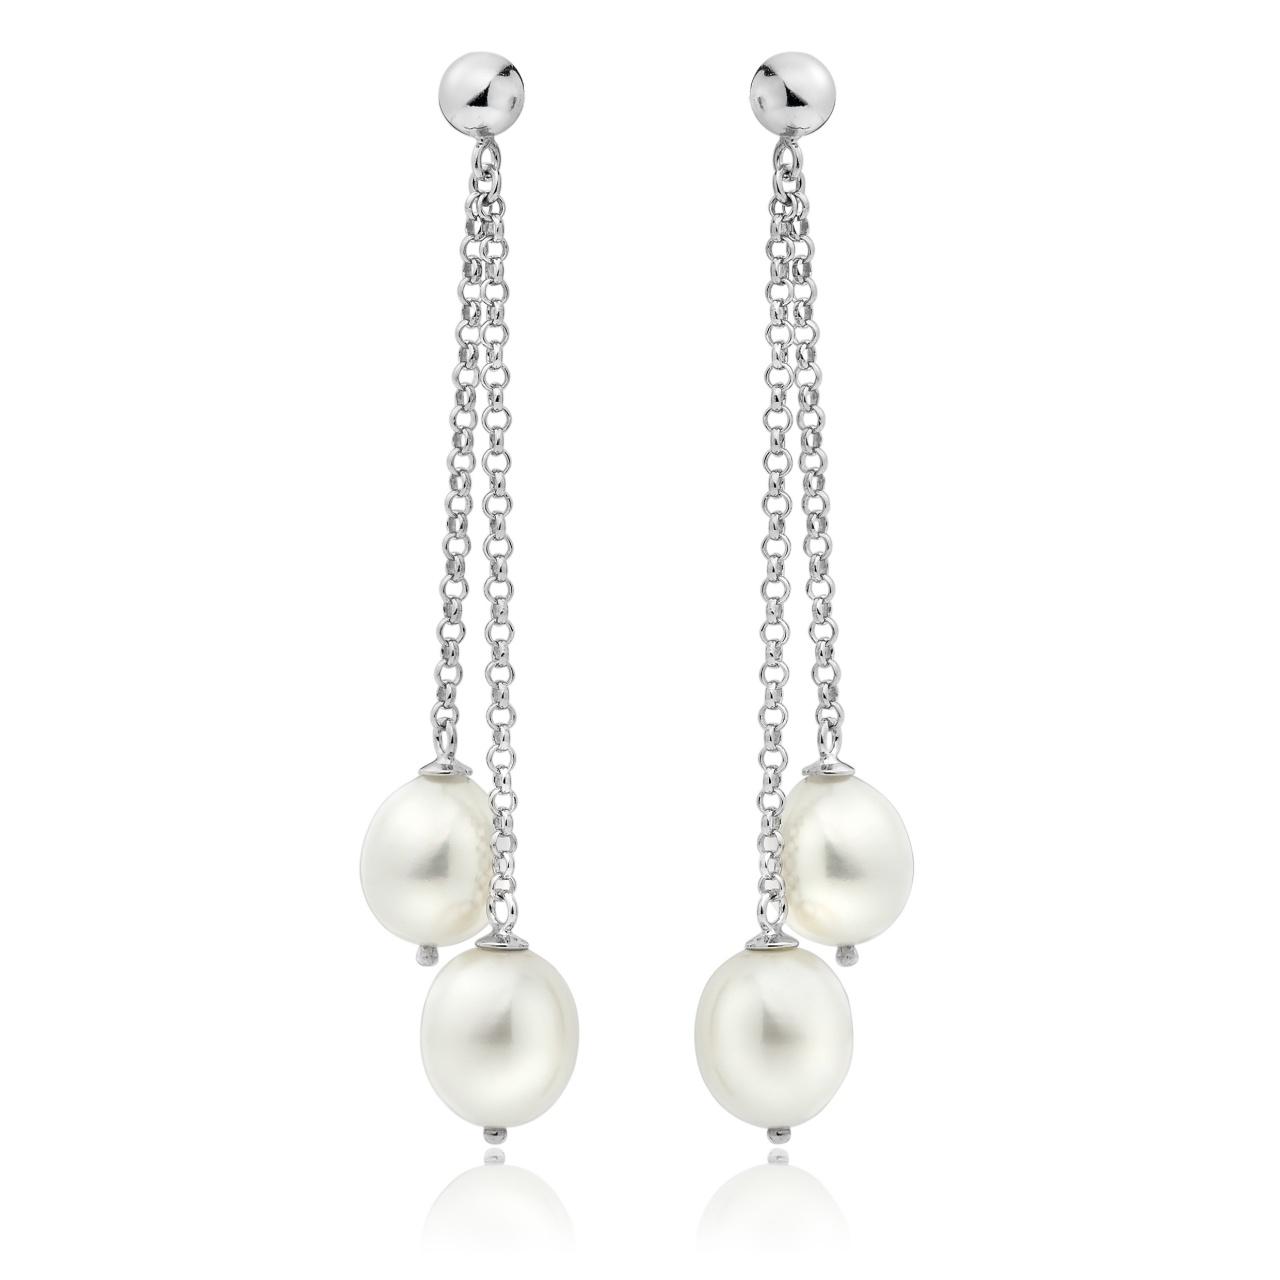 White Freshwater Pearl Waterfall Earrings in Silver